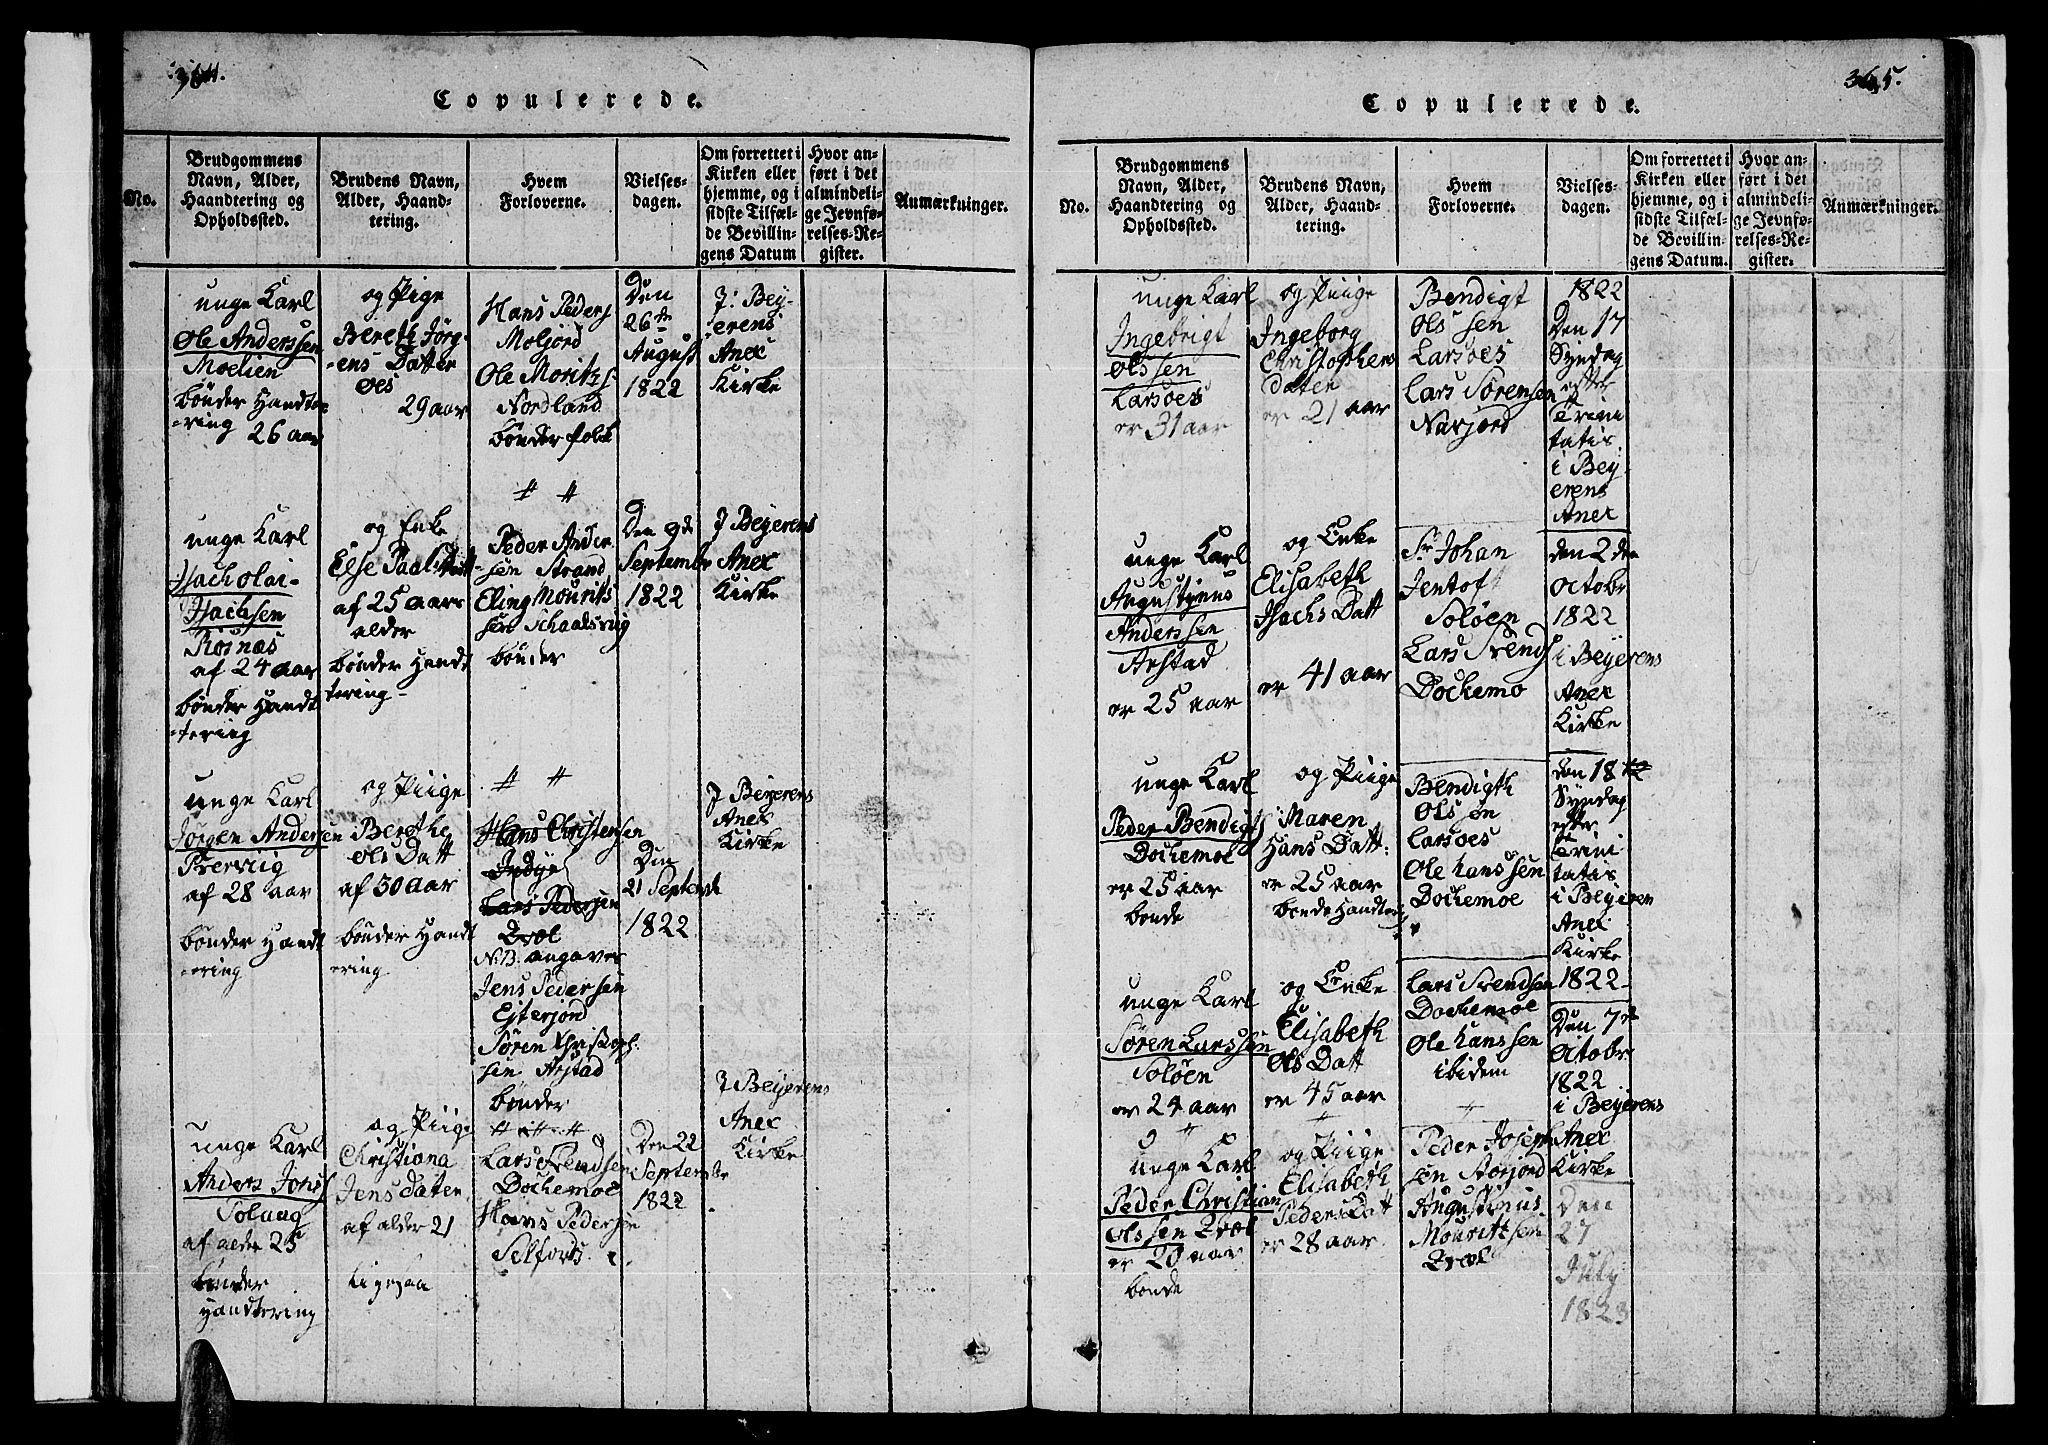 SAT, Ministerialprotokoller, klokkerbøker og fødselsregistre - Nordland, 846/L0651: Klokkerbok nr. 846C01, 1821-1841, s. 364-365